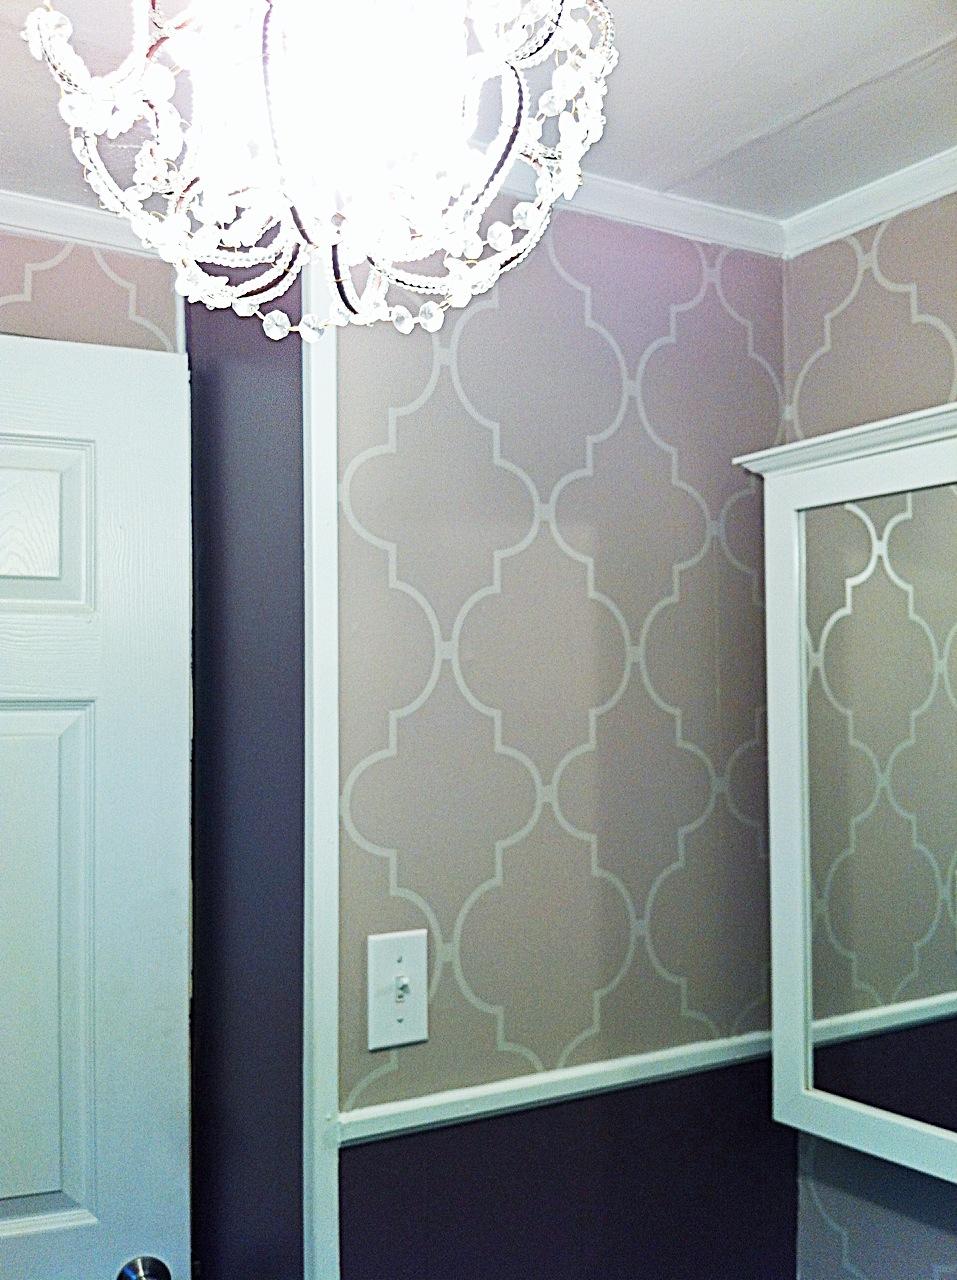 Princess bathroom reveal Cozy Crooked Cottage 957x1280